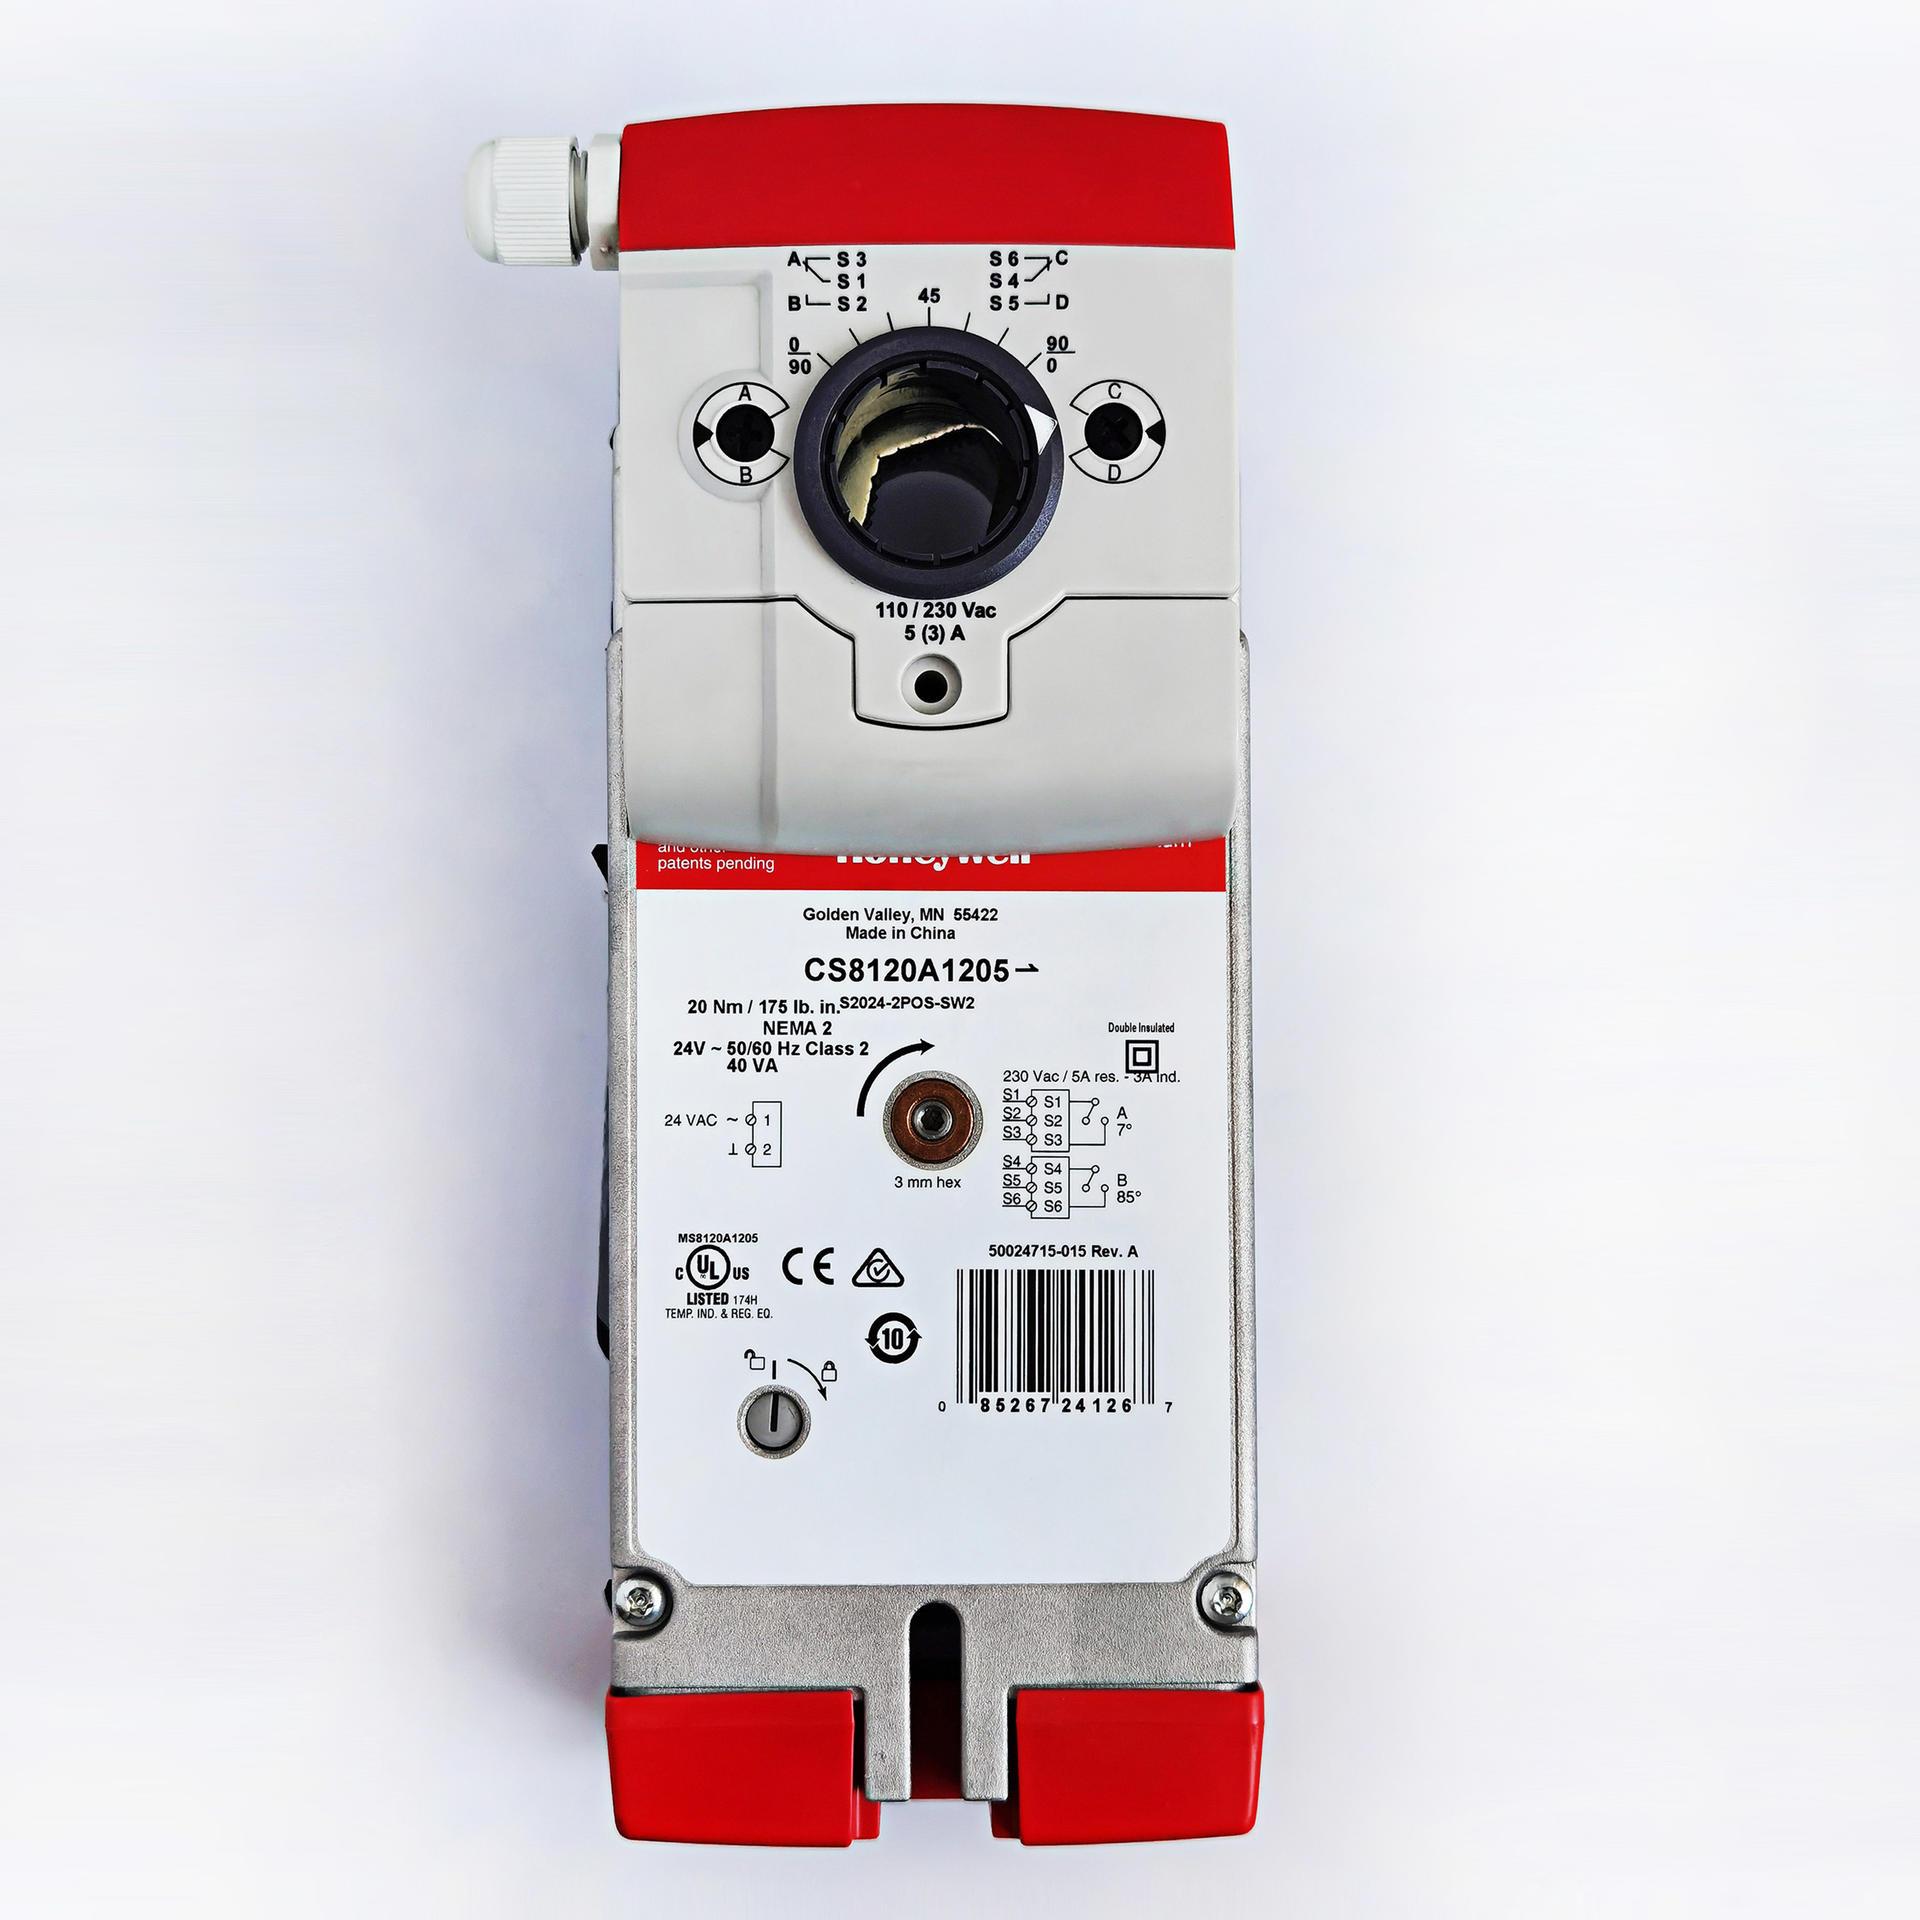 CS8120A1007 CS8120A1205 开关型弹簧复位风门执行器  (5)-产.jpg